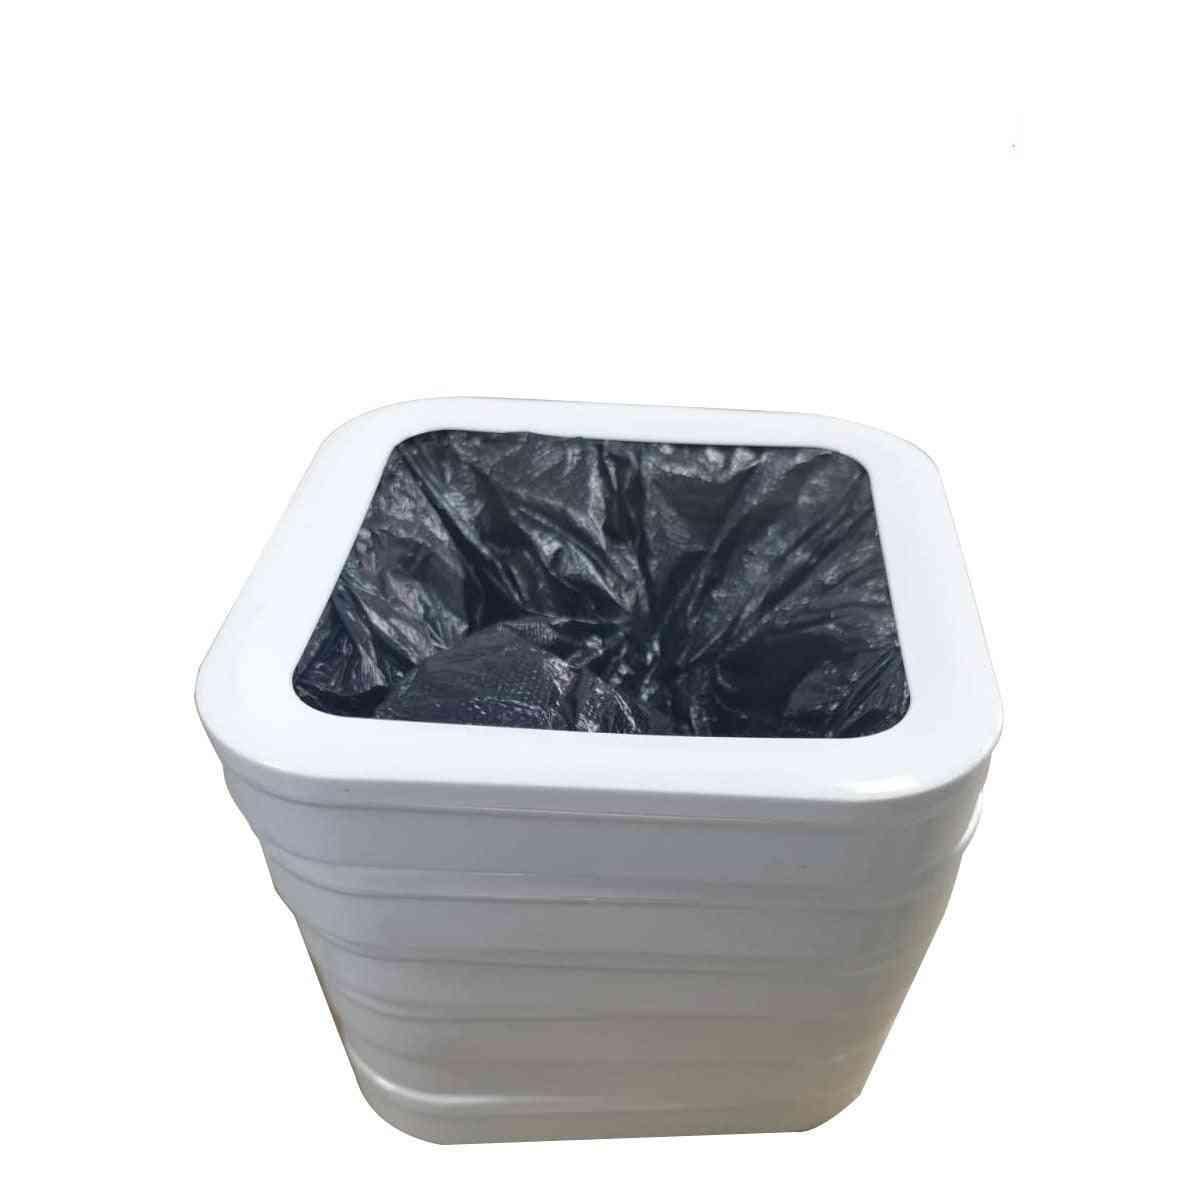 Smart Trash Can Trash Box Suit